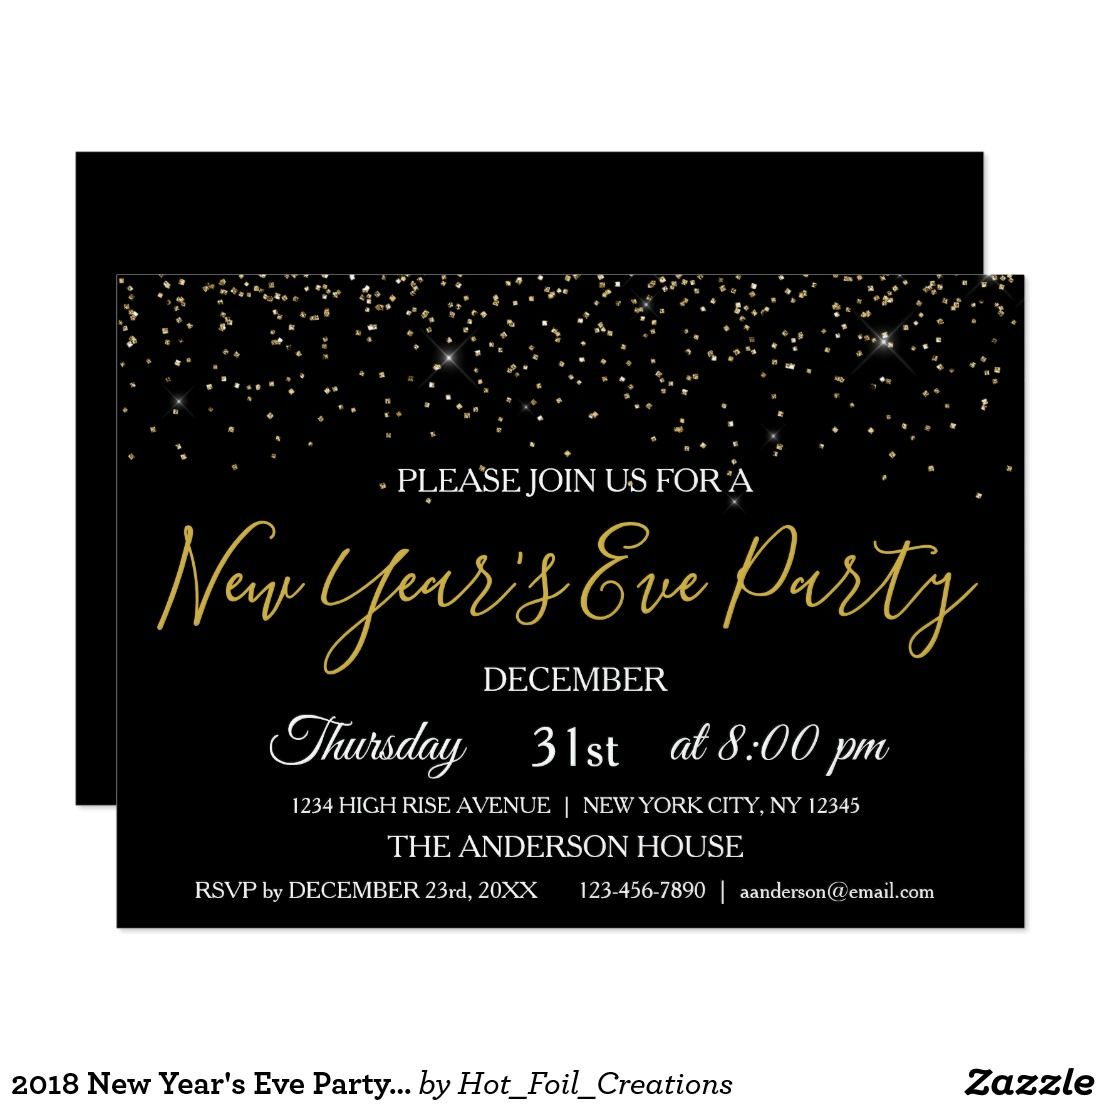 2020 New Year's Eve Party Glitter Sparkle Invite Zazzle